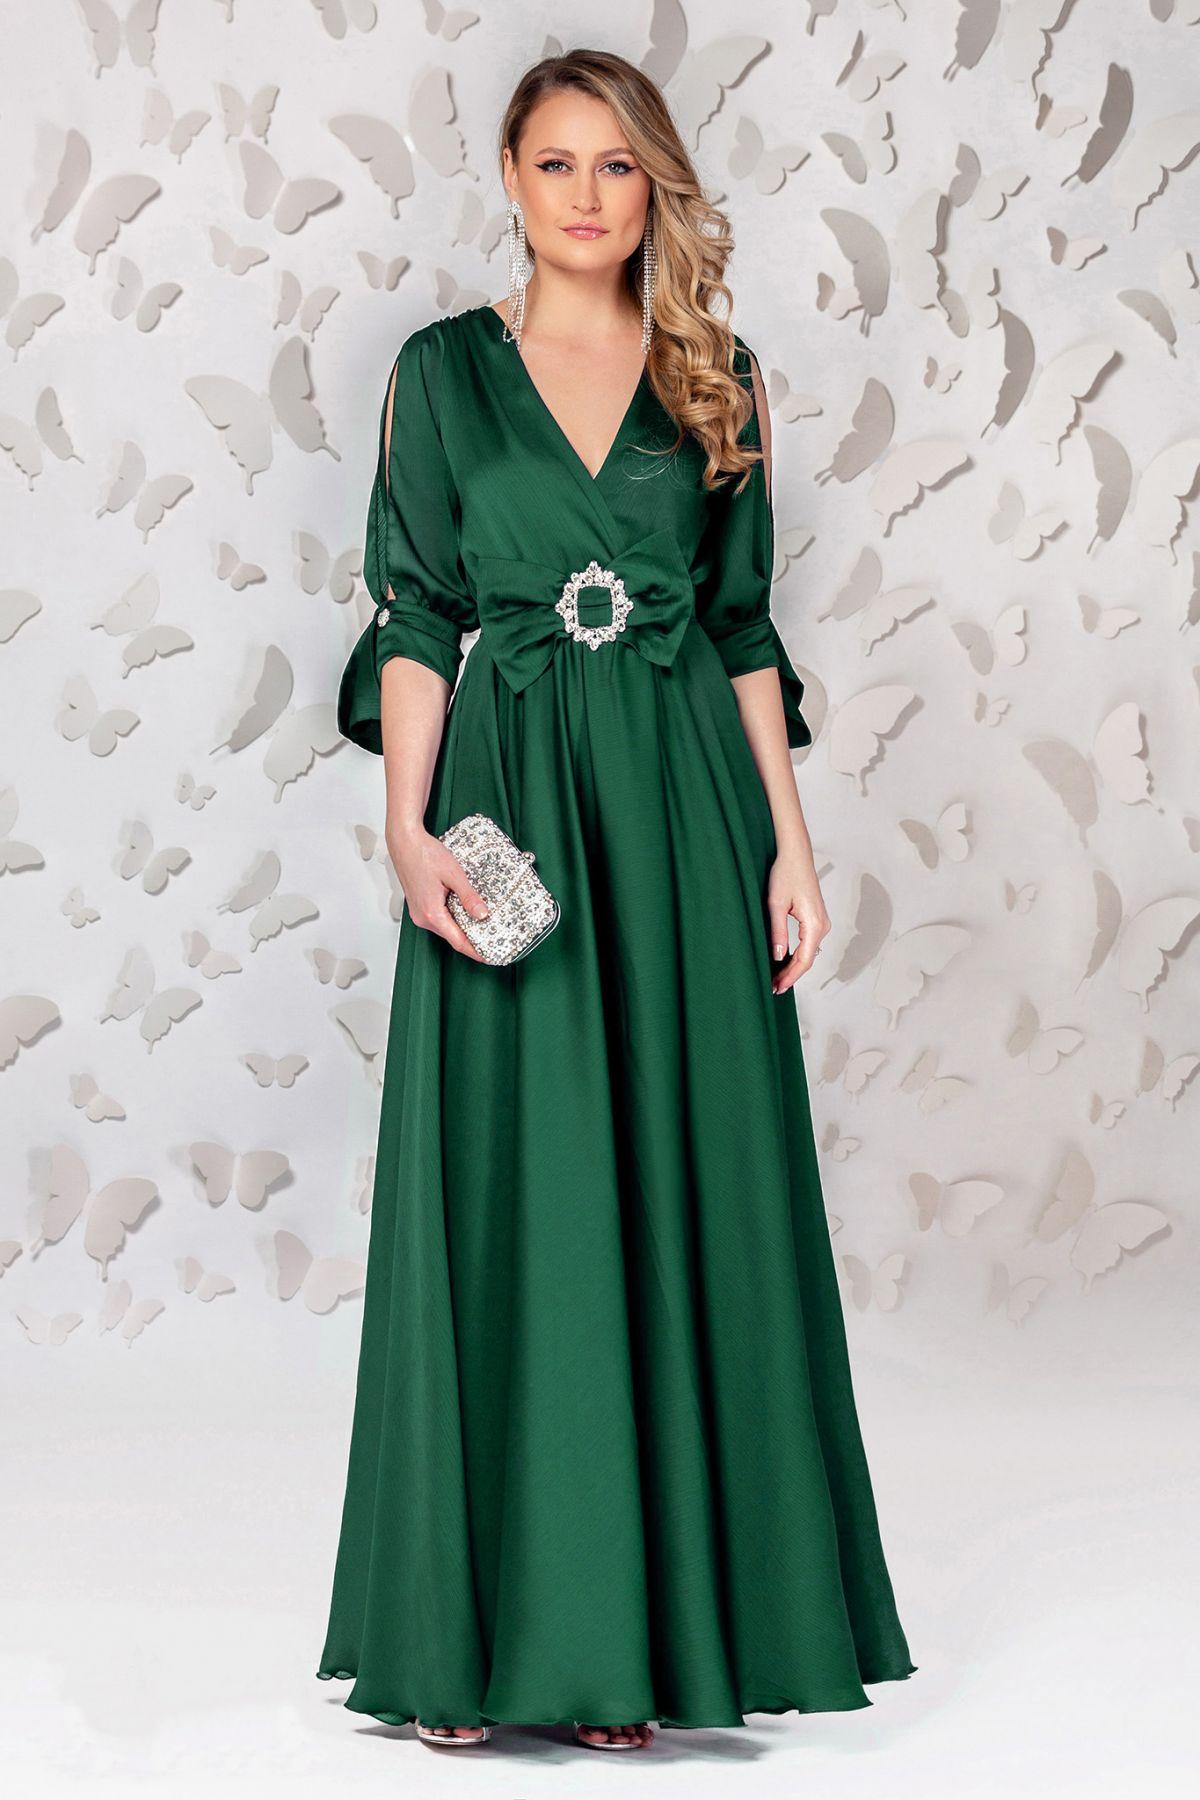 Rochie Pretty Girl lunga de seara verde smarald cu cordon tip funda